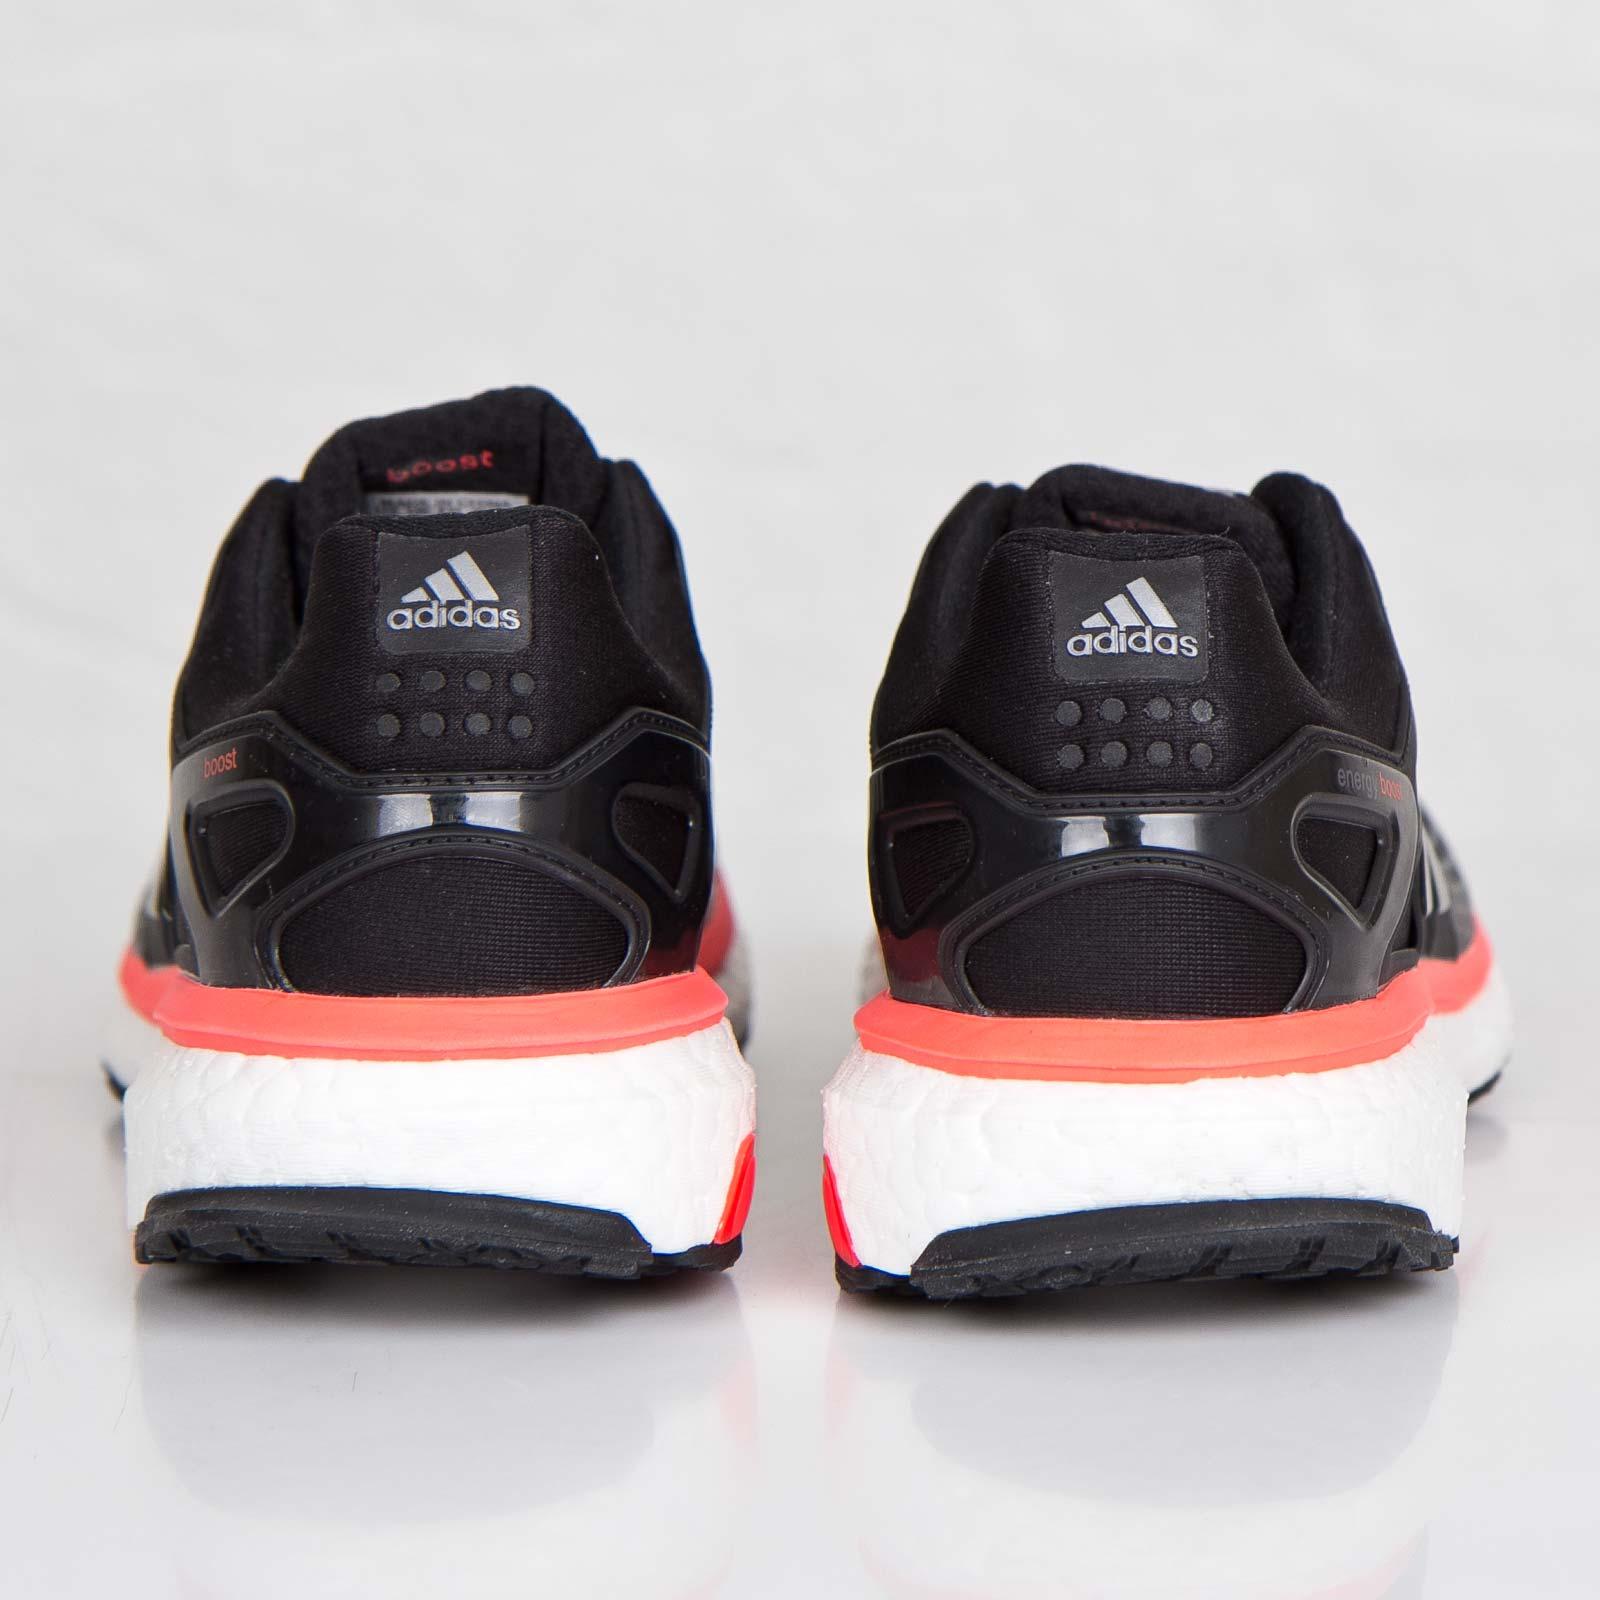 1004ff9aa4e adidas energy boost 2 ATR m - M18750 - Sneakersnstuff